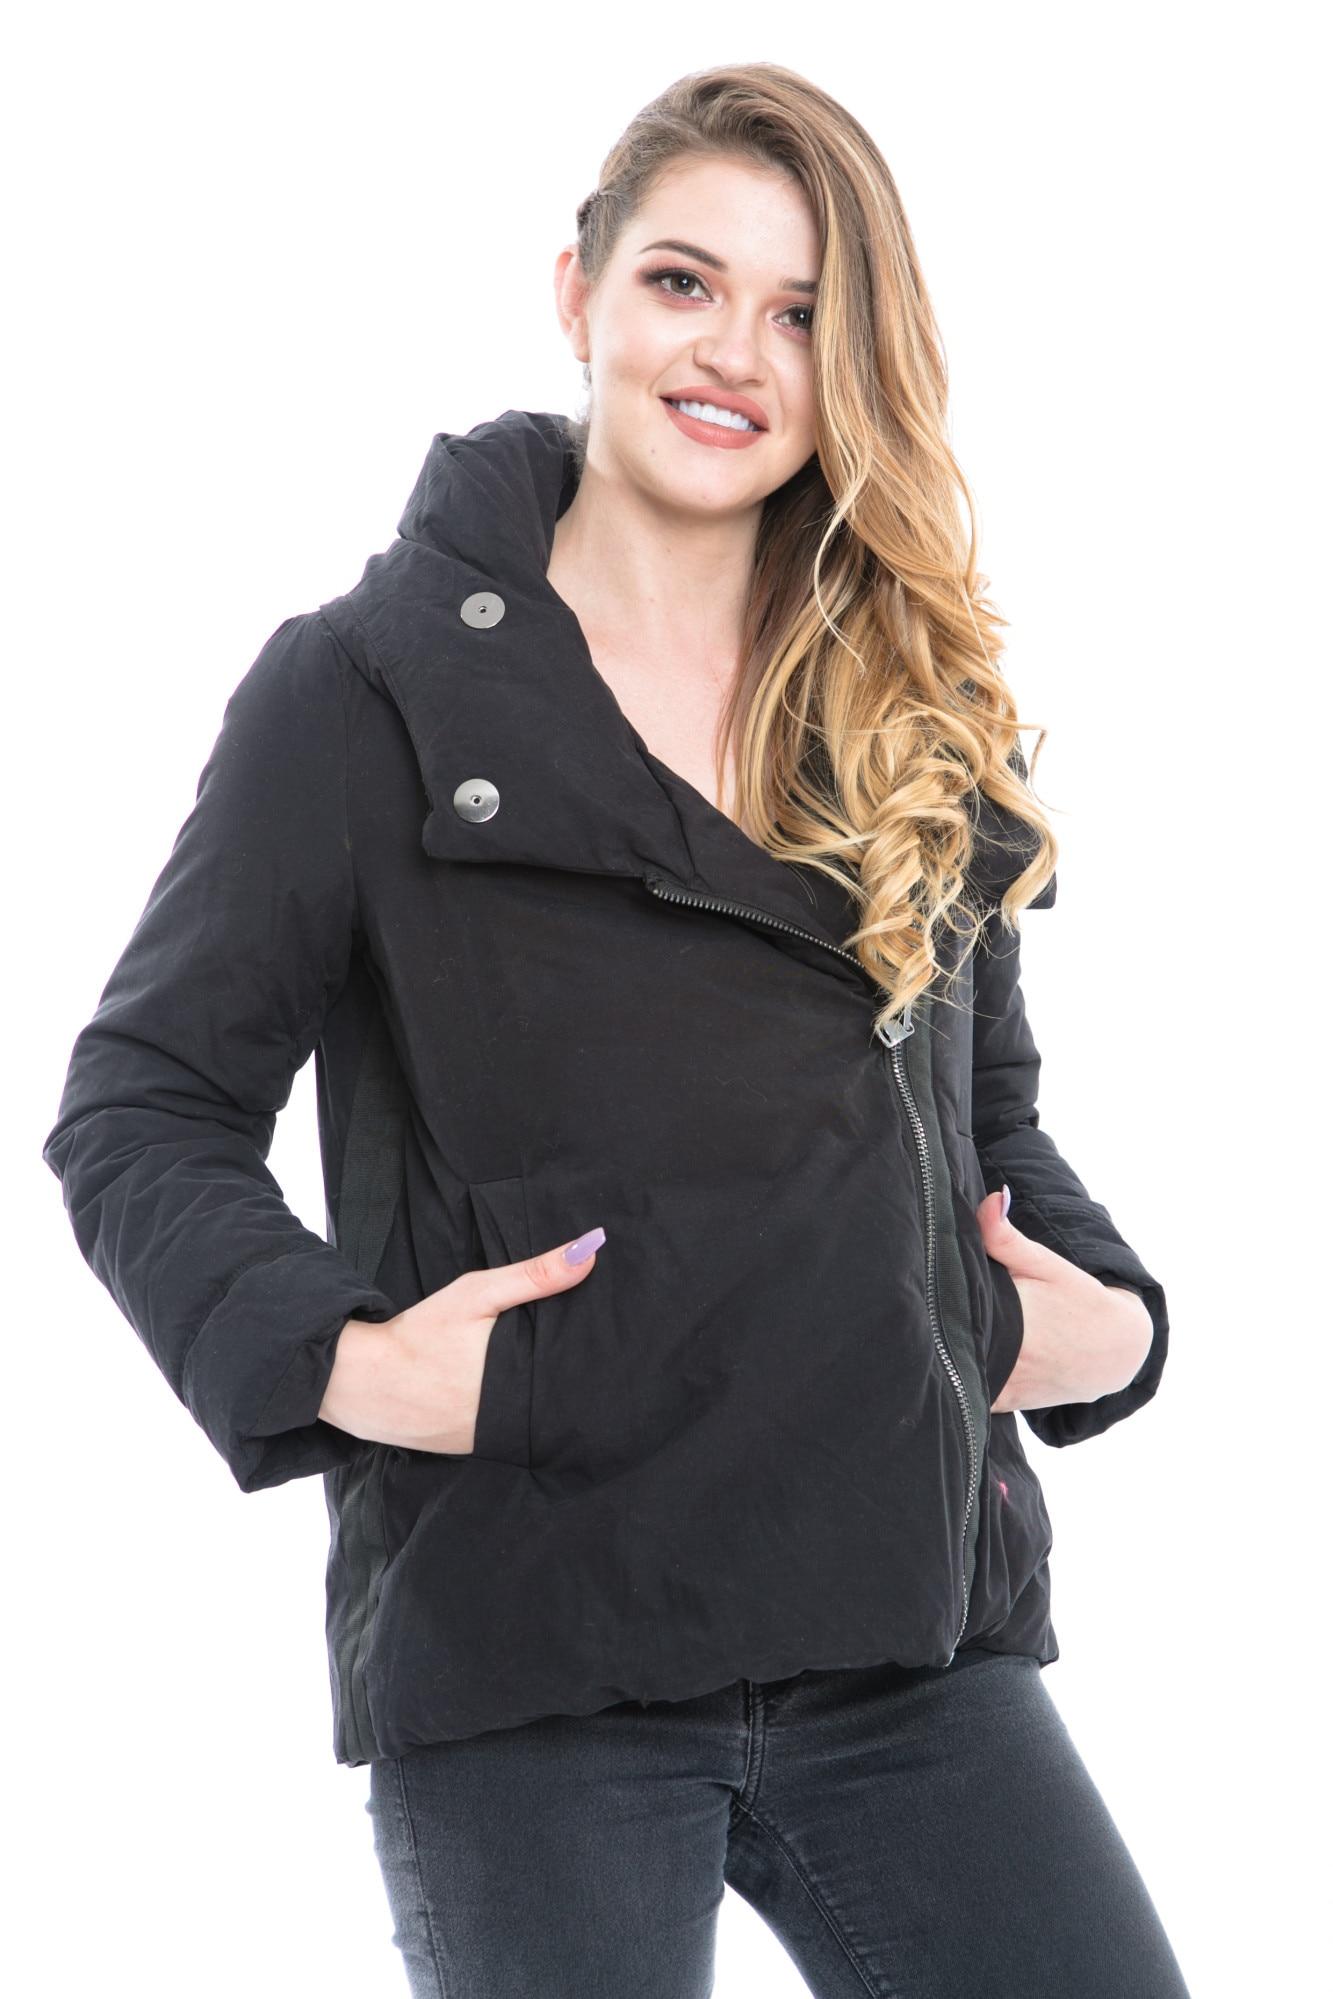 Női kabát Zara, fekete, méret S eMAG.hu